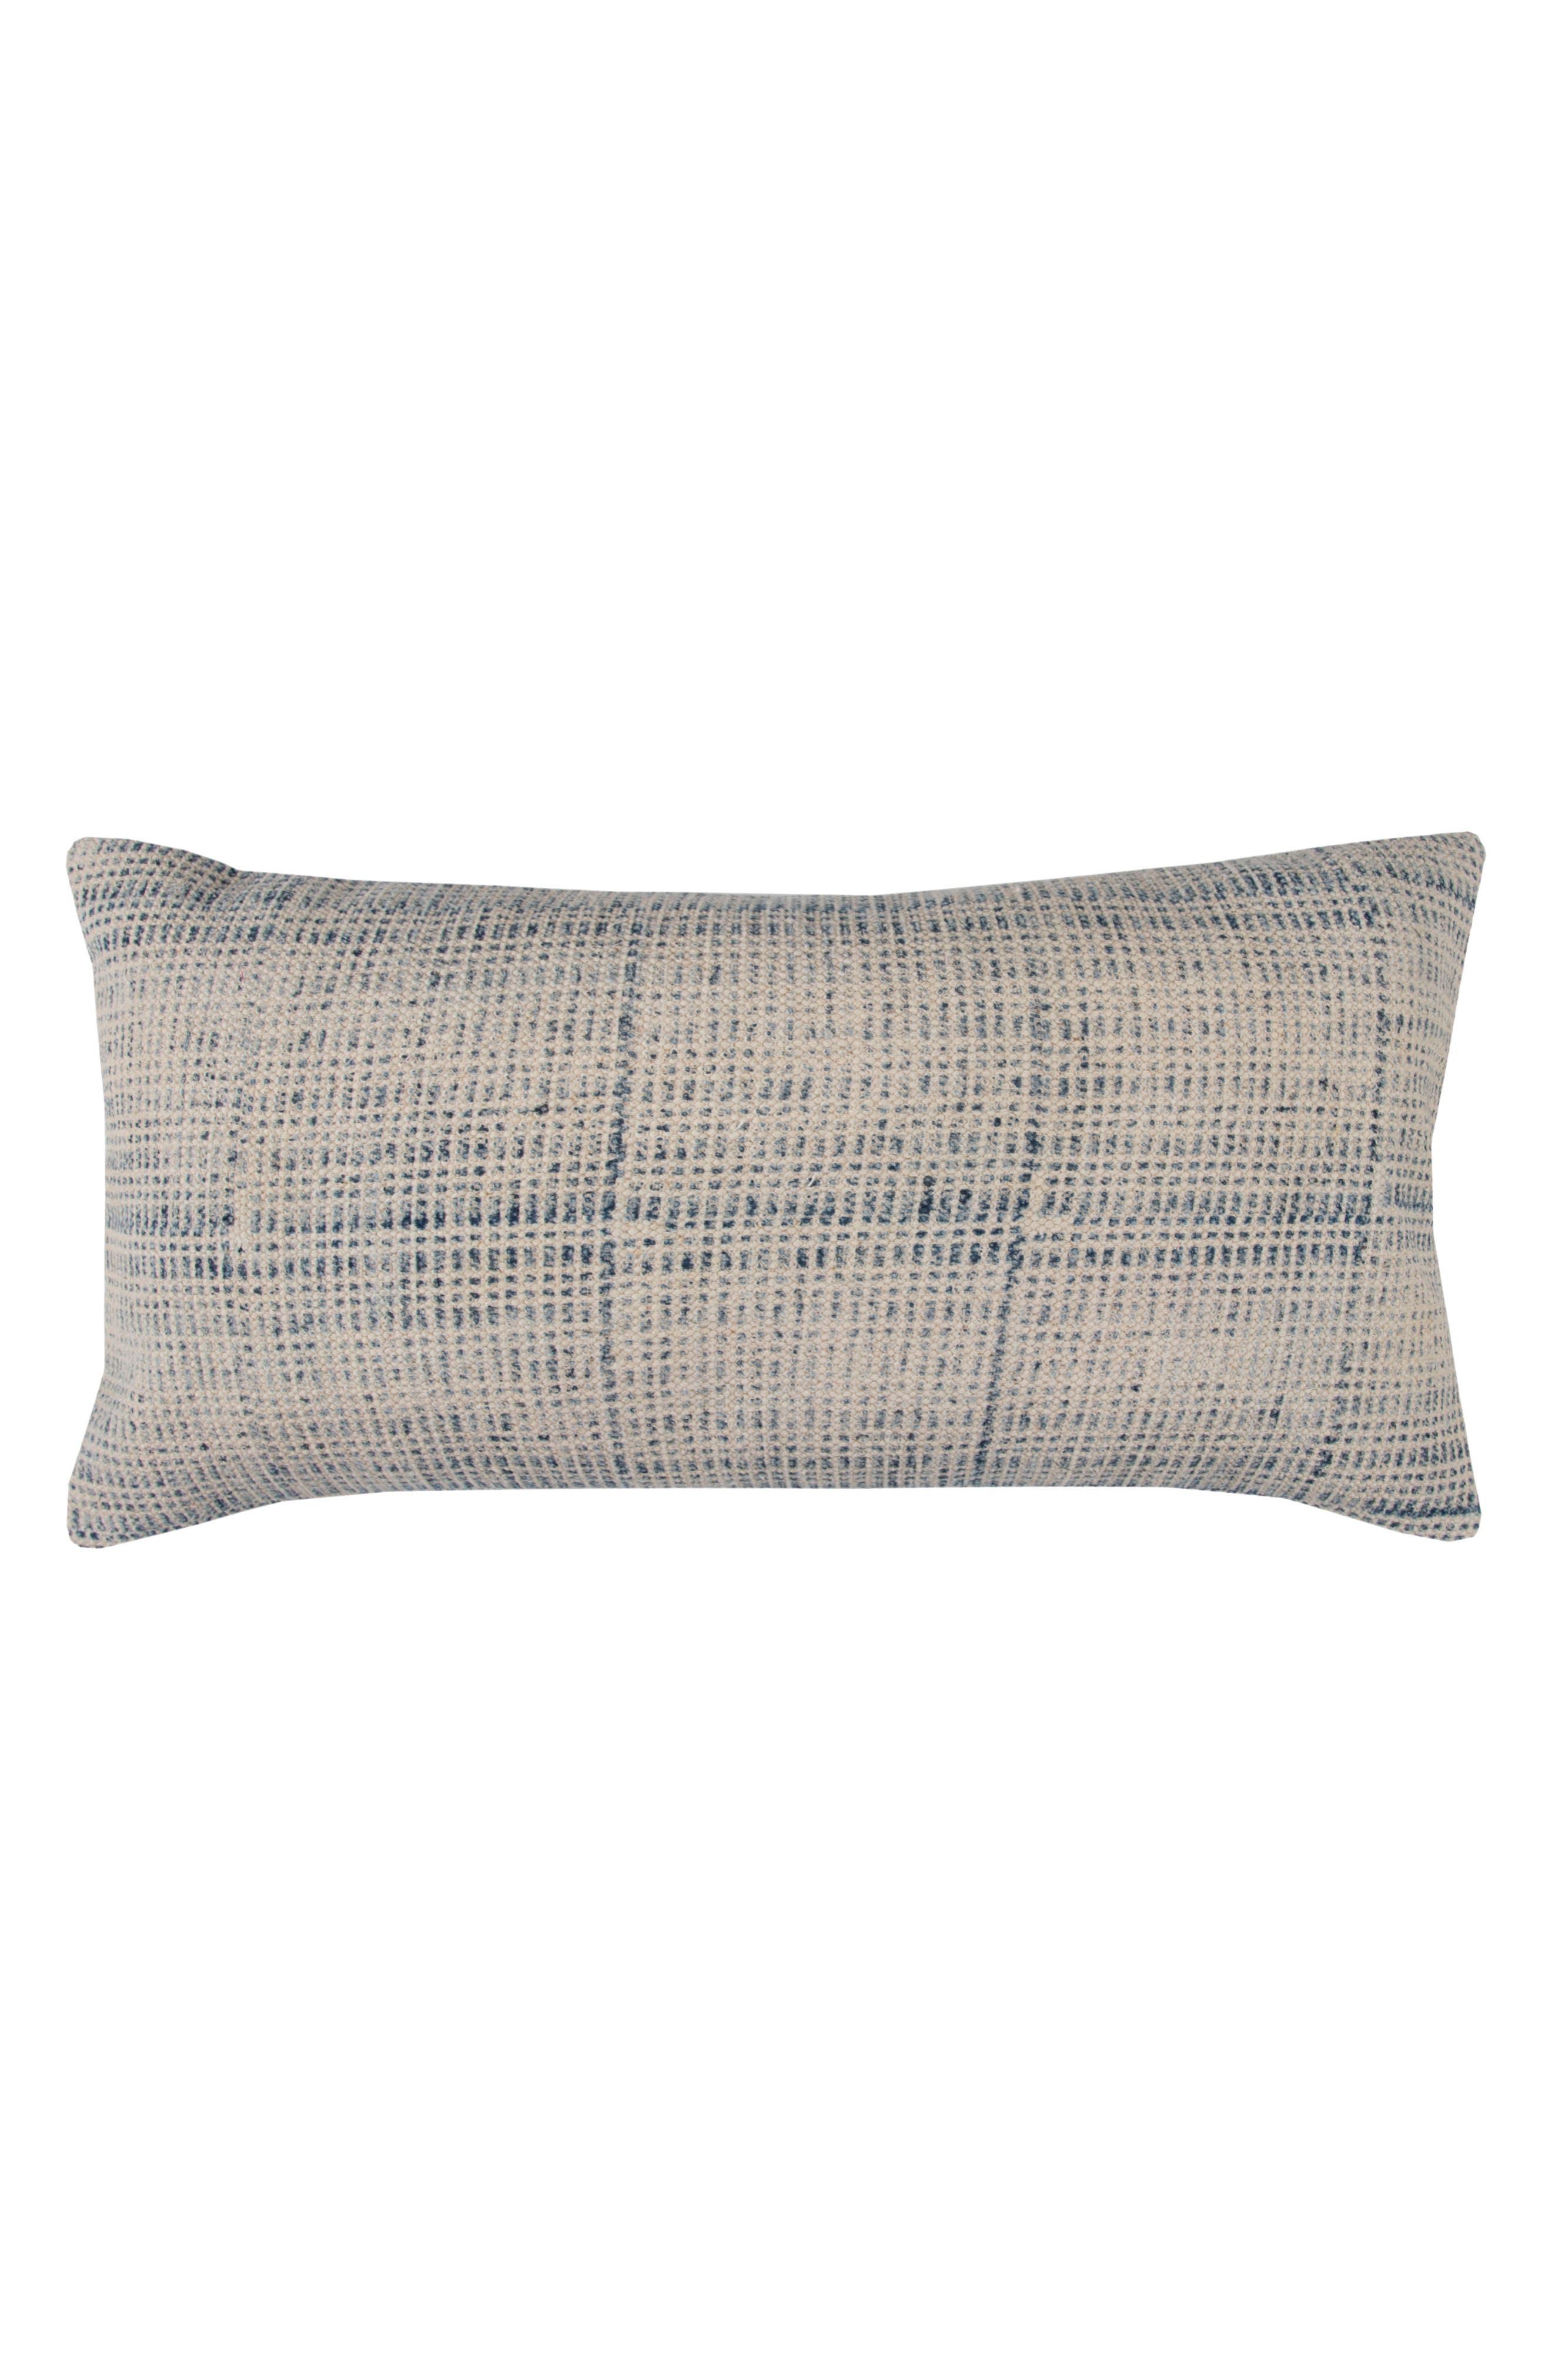 Woven Accent Pillow,                             Main thumbnail 2, color,